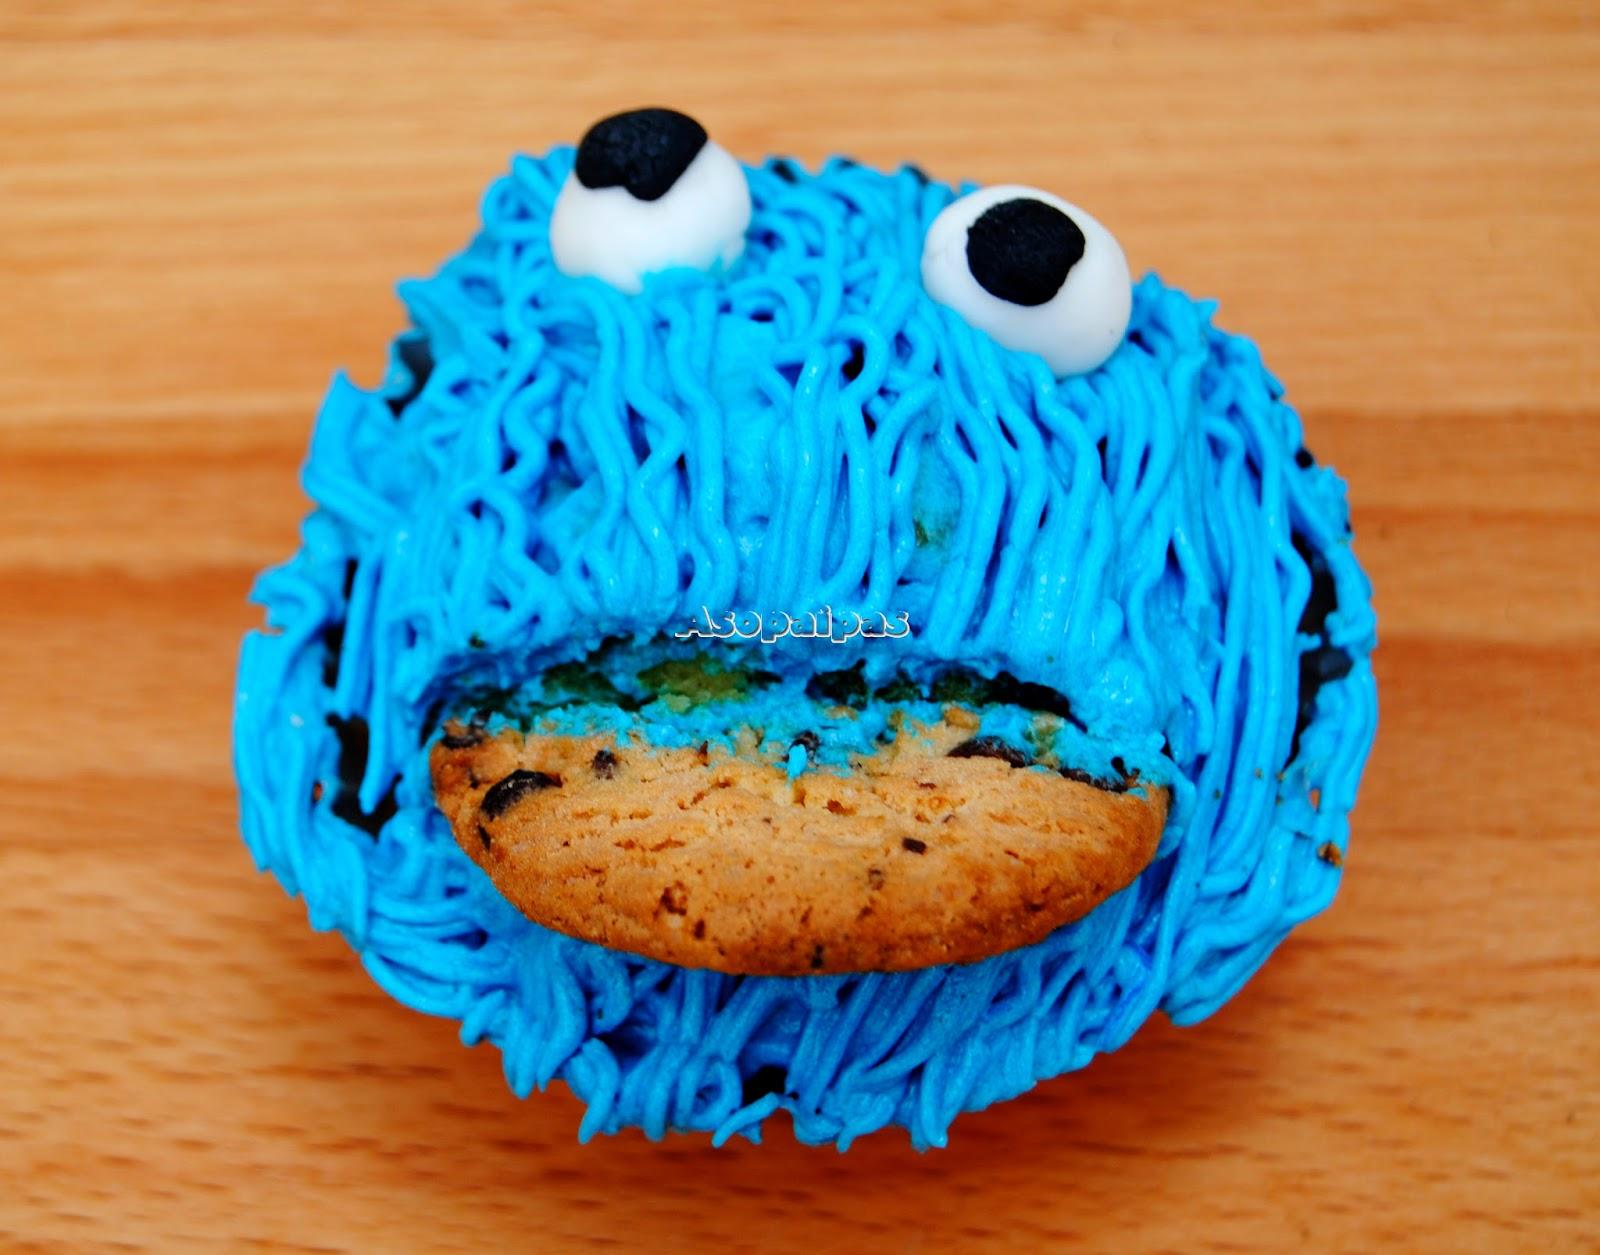 http://www.asopaipas.com/2014/06/cupcakes-monstruo-de-las-galletas.html